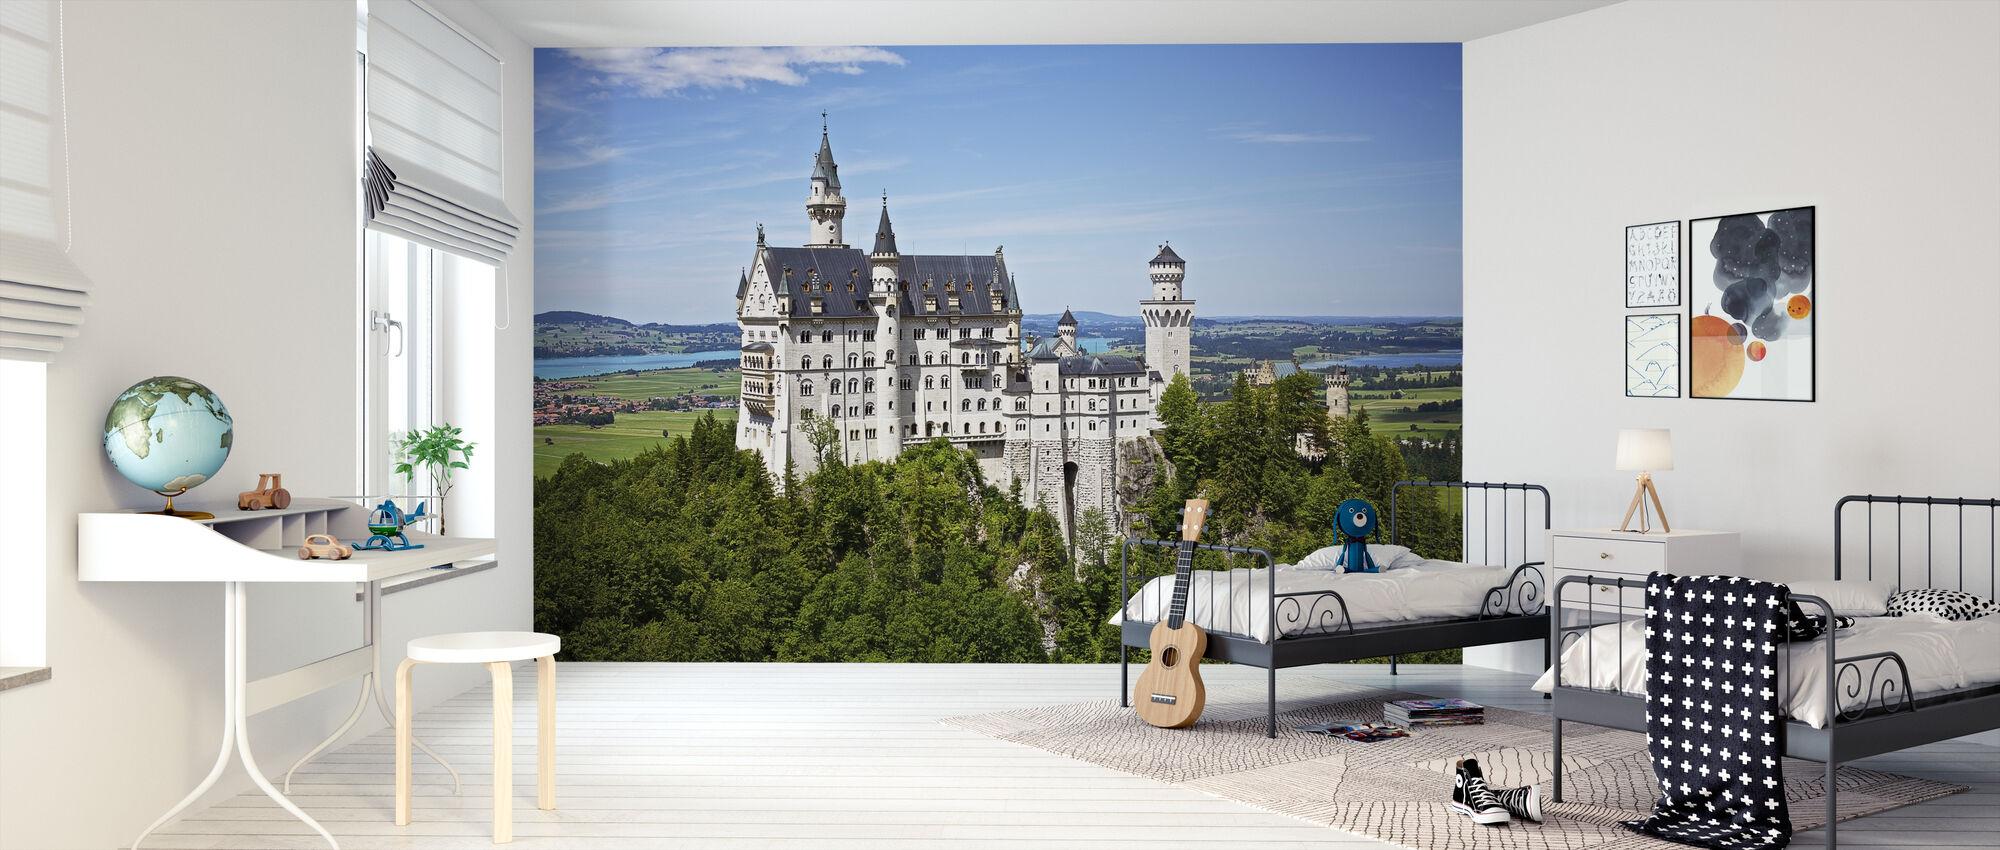 Neuschwanstein Disney Castle High Quality Wall Murals With